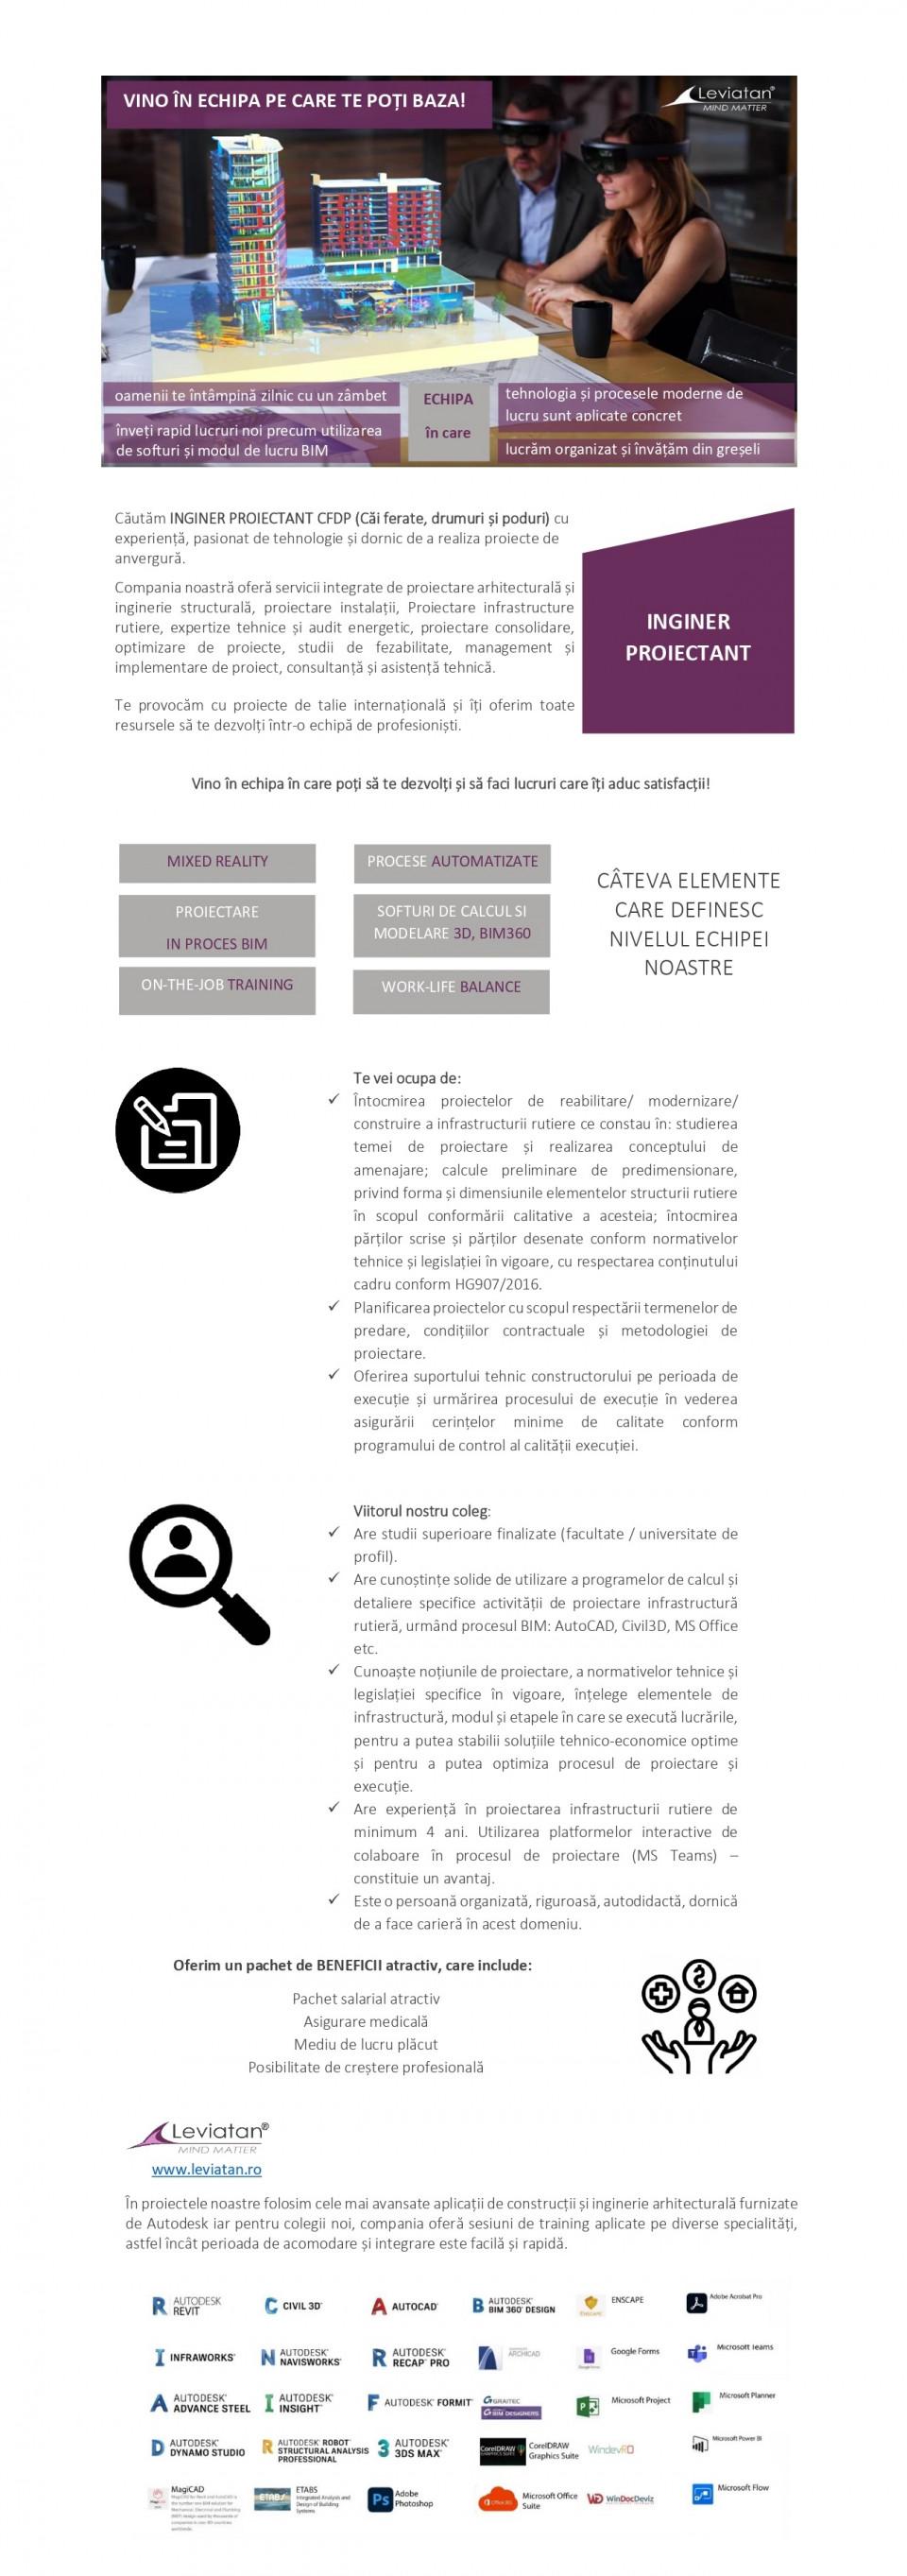 INGINER PROIECTANT CFDP (Căi ferate, drumuri și poduri)